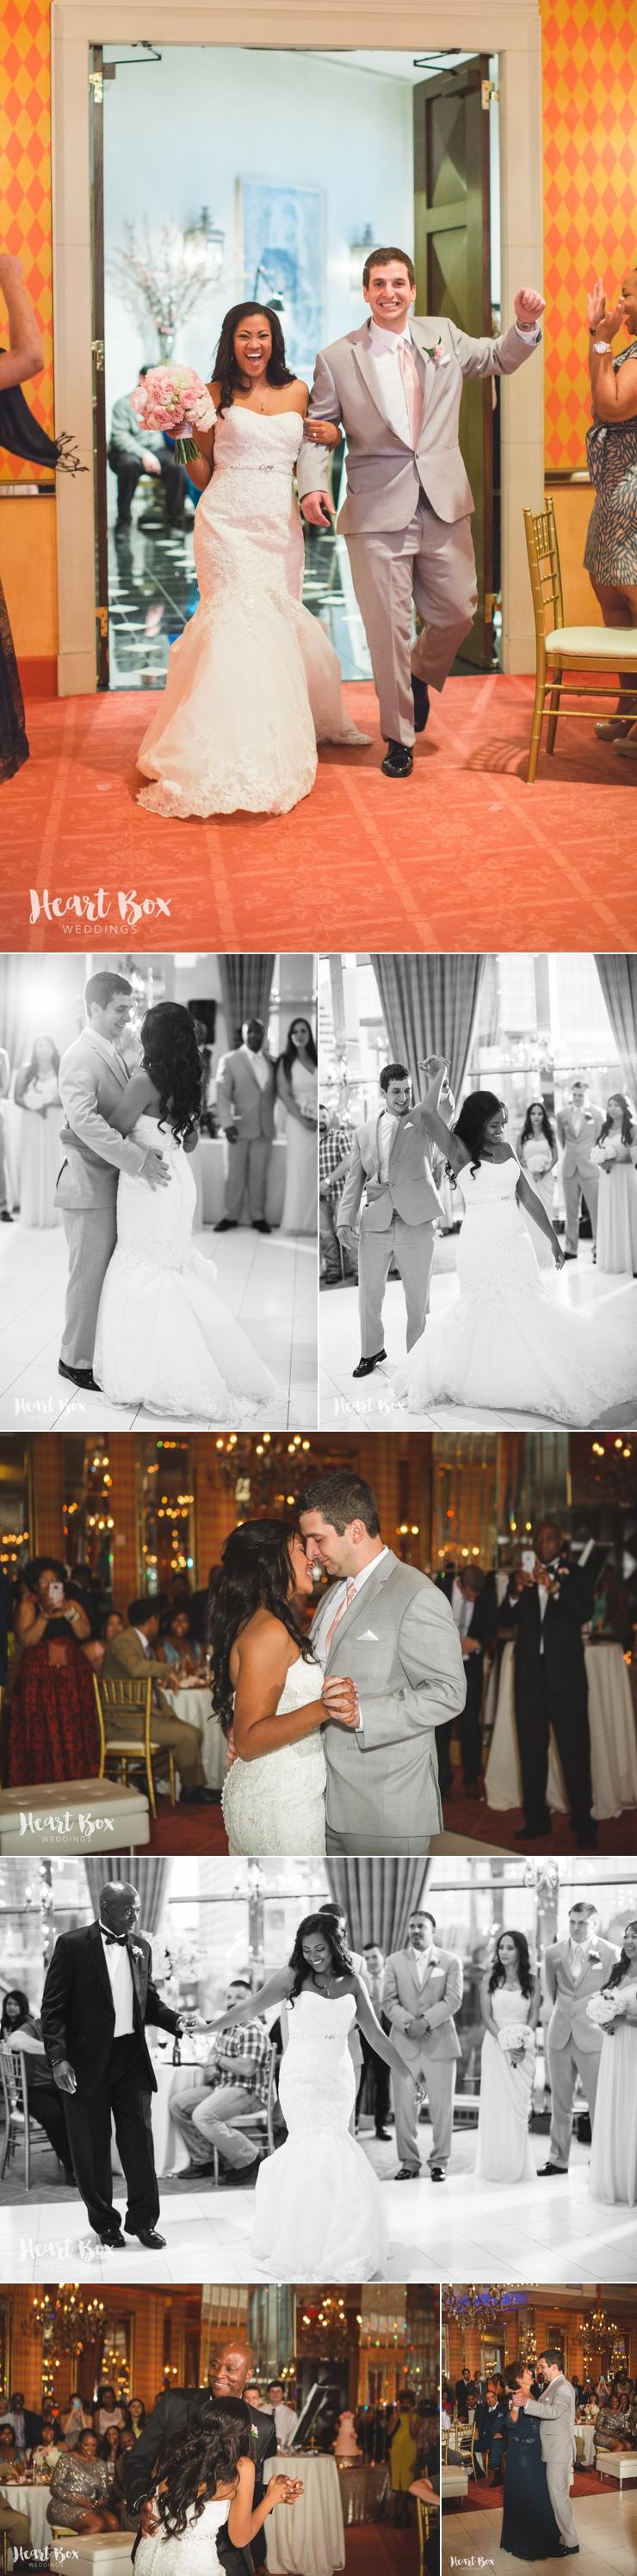 Smith Wedding Blog Collages 12.jpg